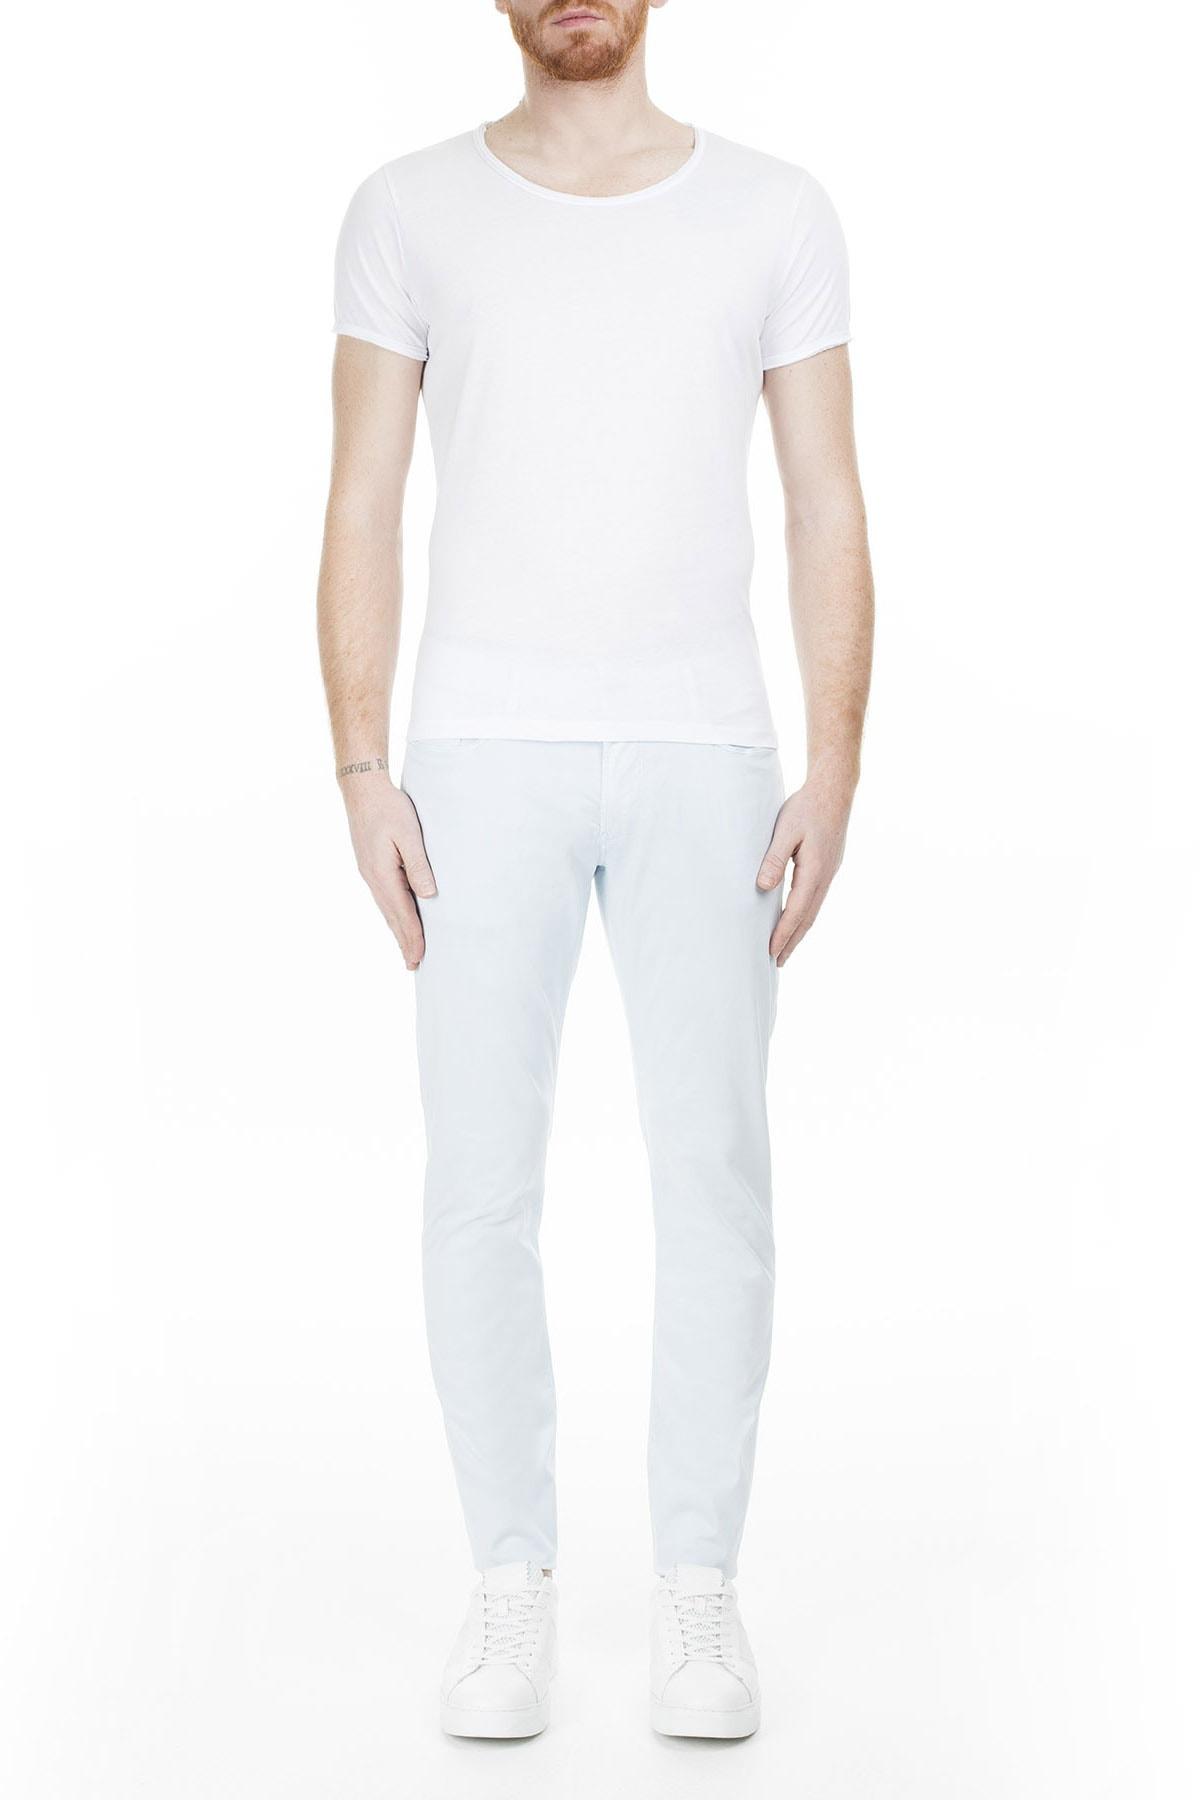 Armani Jeans Armani J06 Jeans Erkek Pamuklu Pantolon 3Y6J06 6Nedz 0504 1